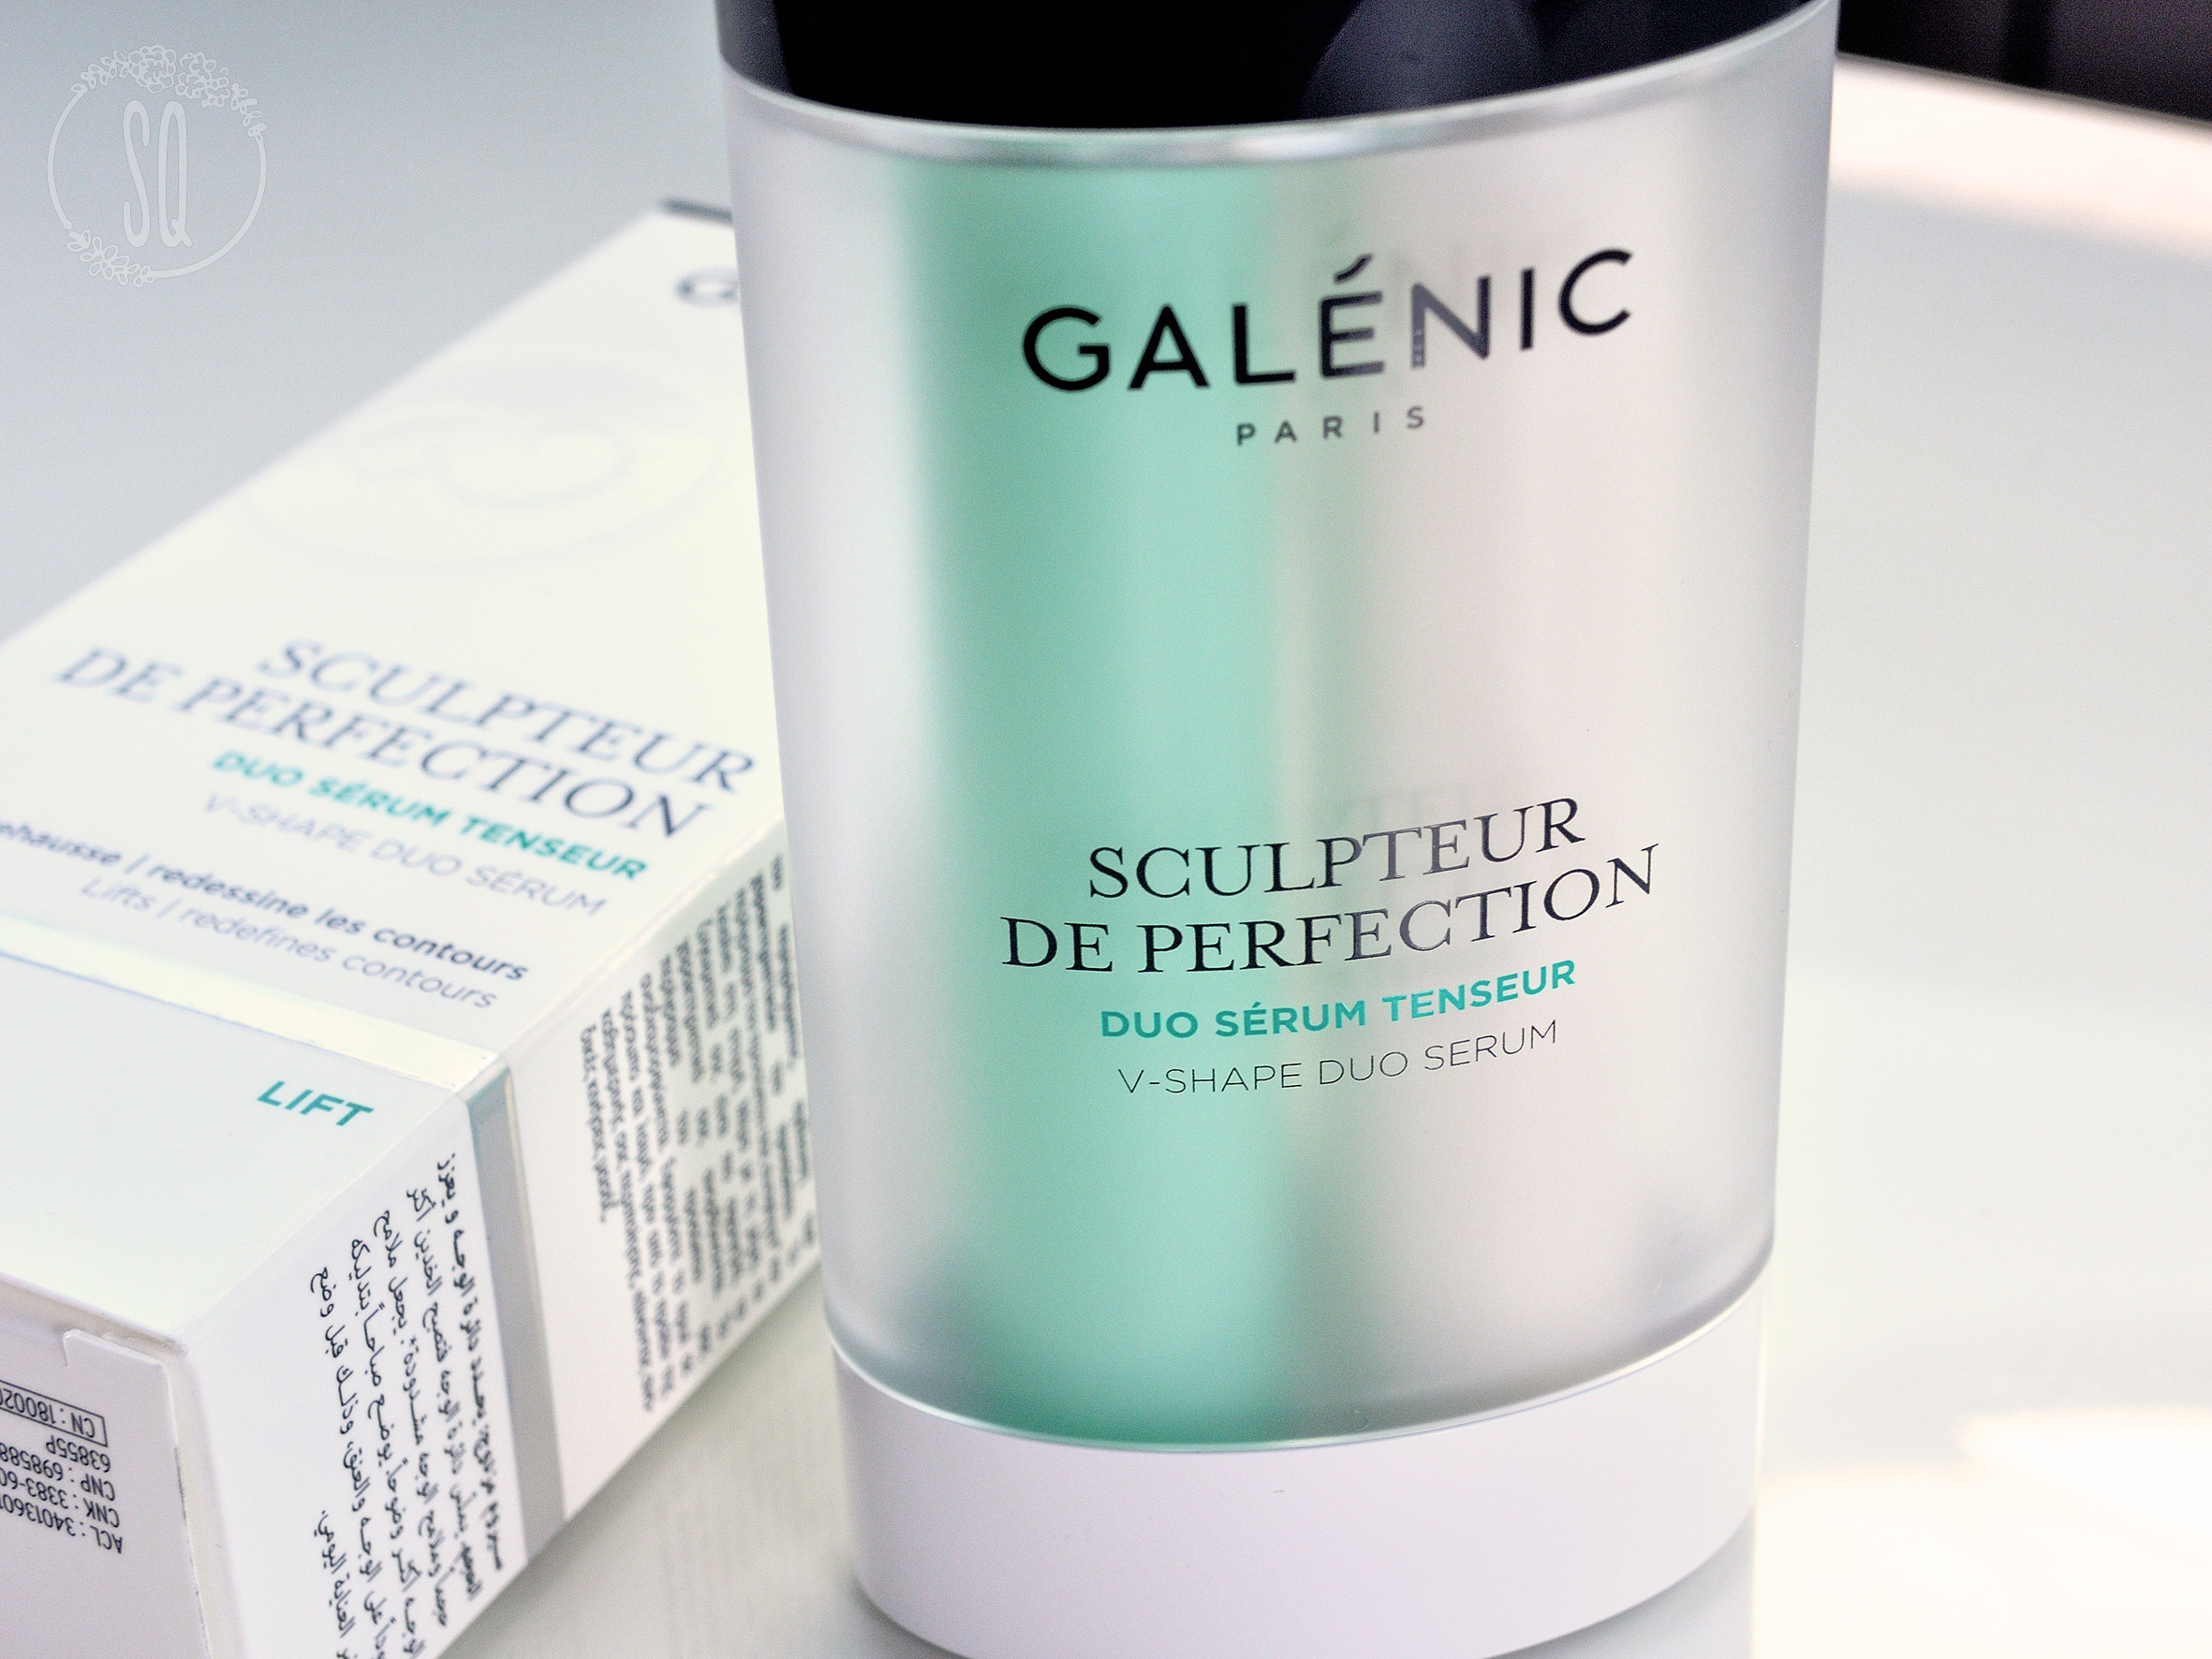 Duo sérum Tensor Sculpteur de Perfection de Galénic